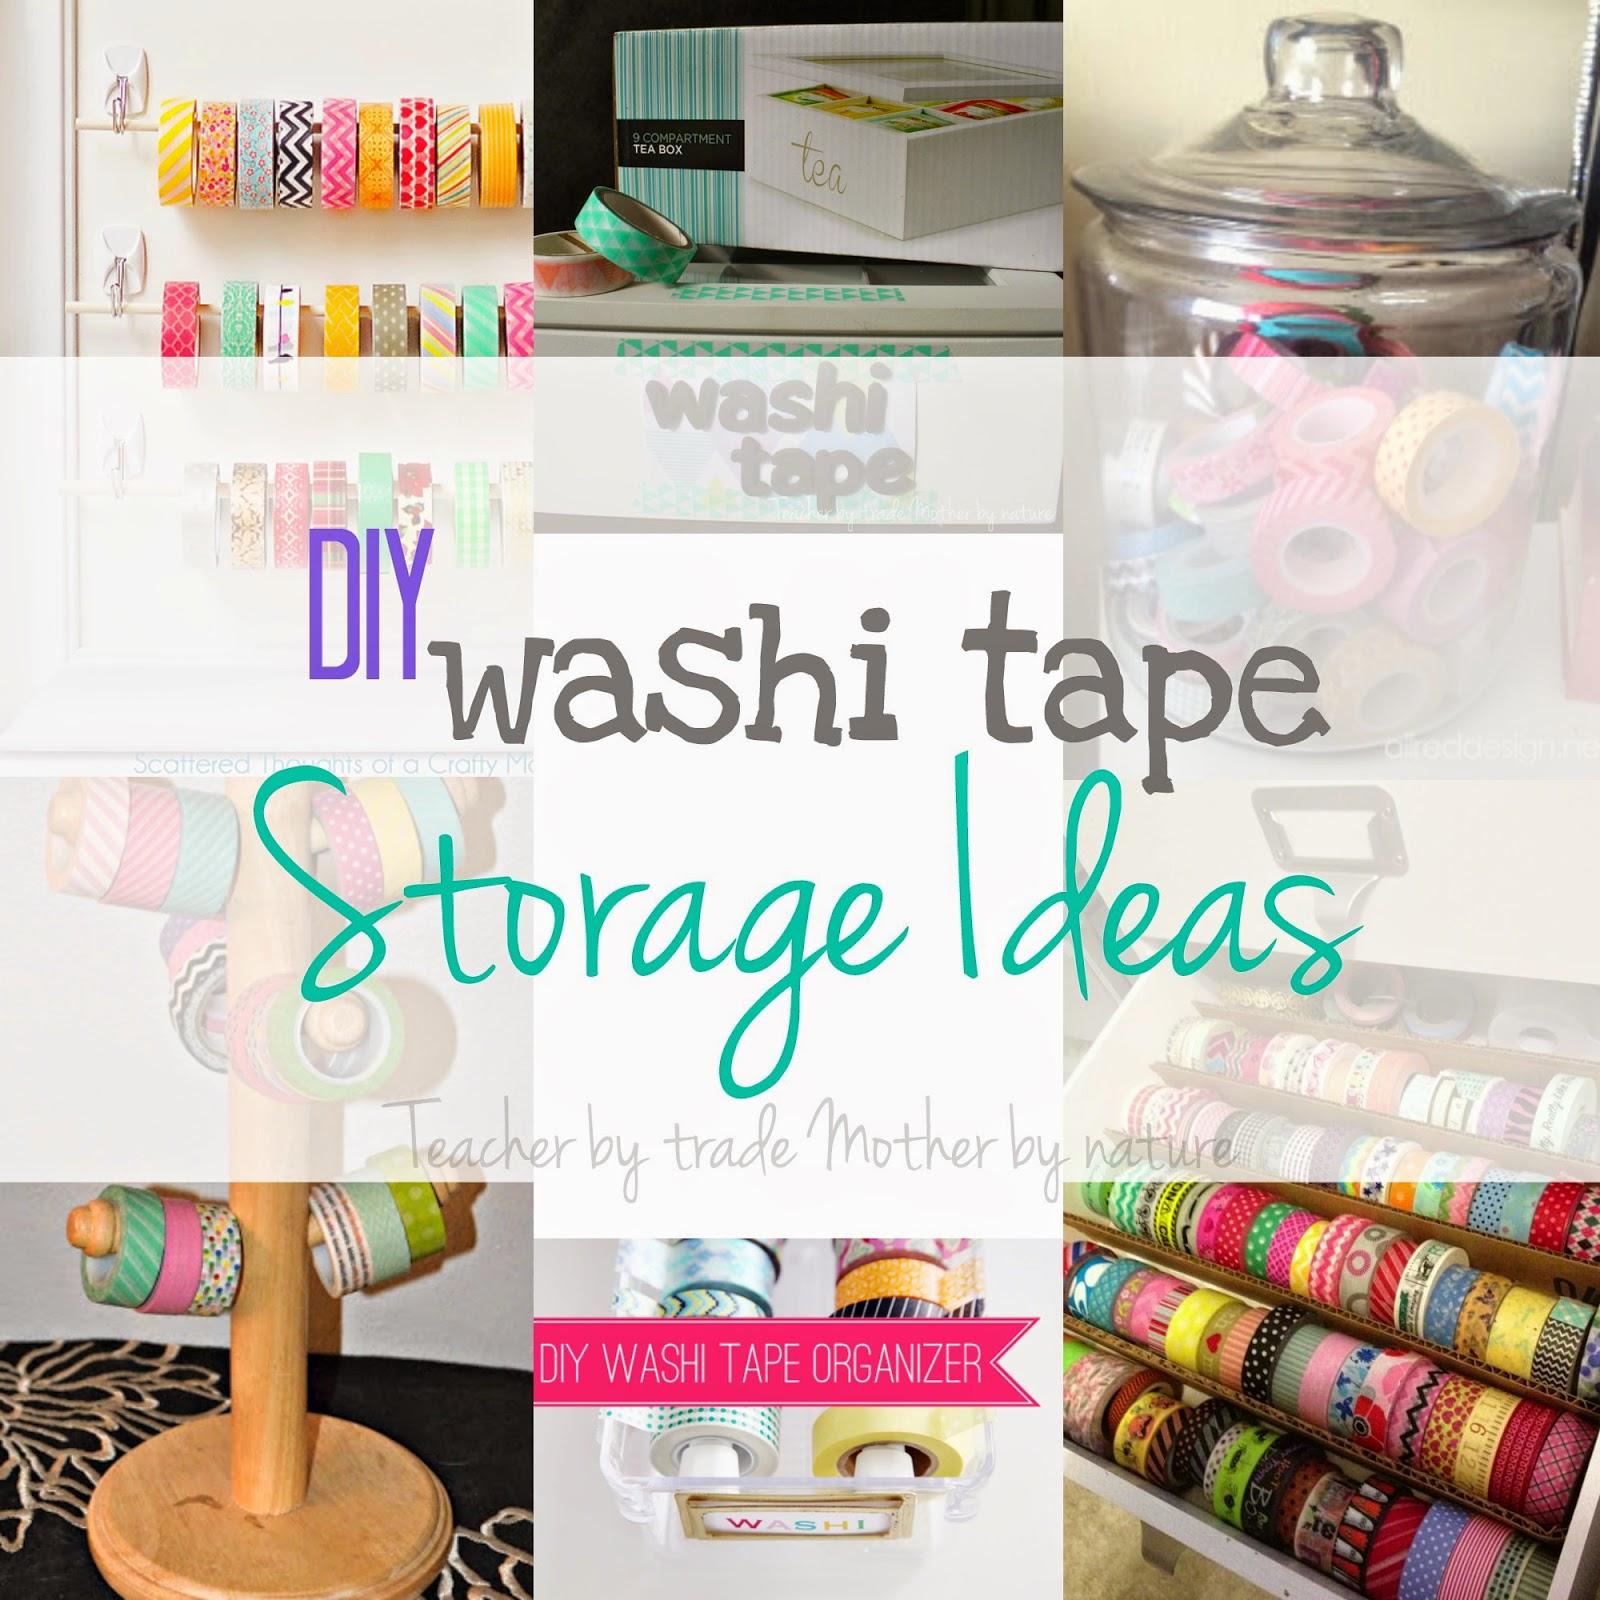 DIY Washi Tape Storage Ideas